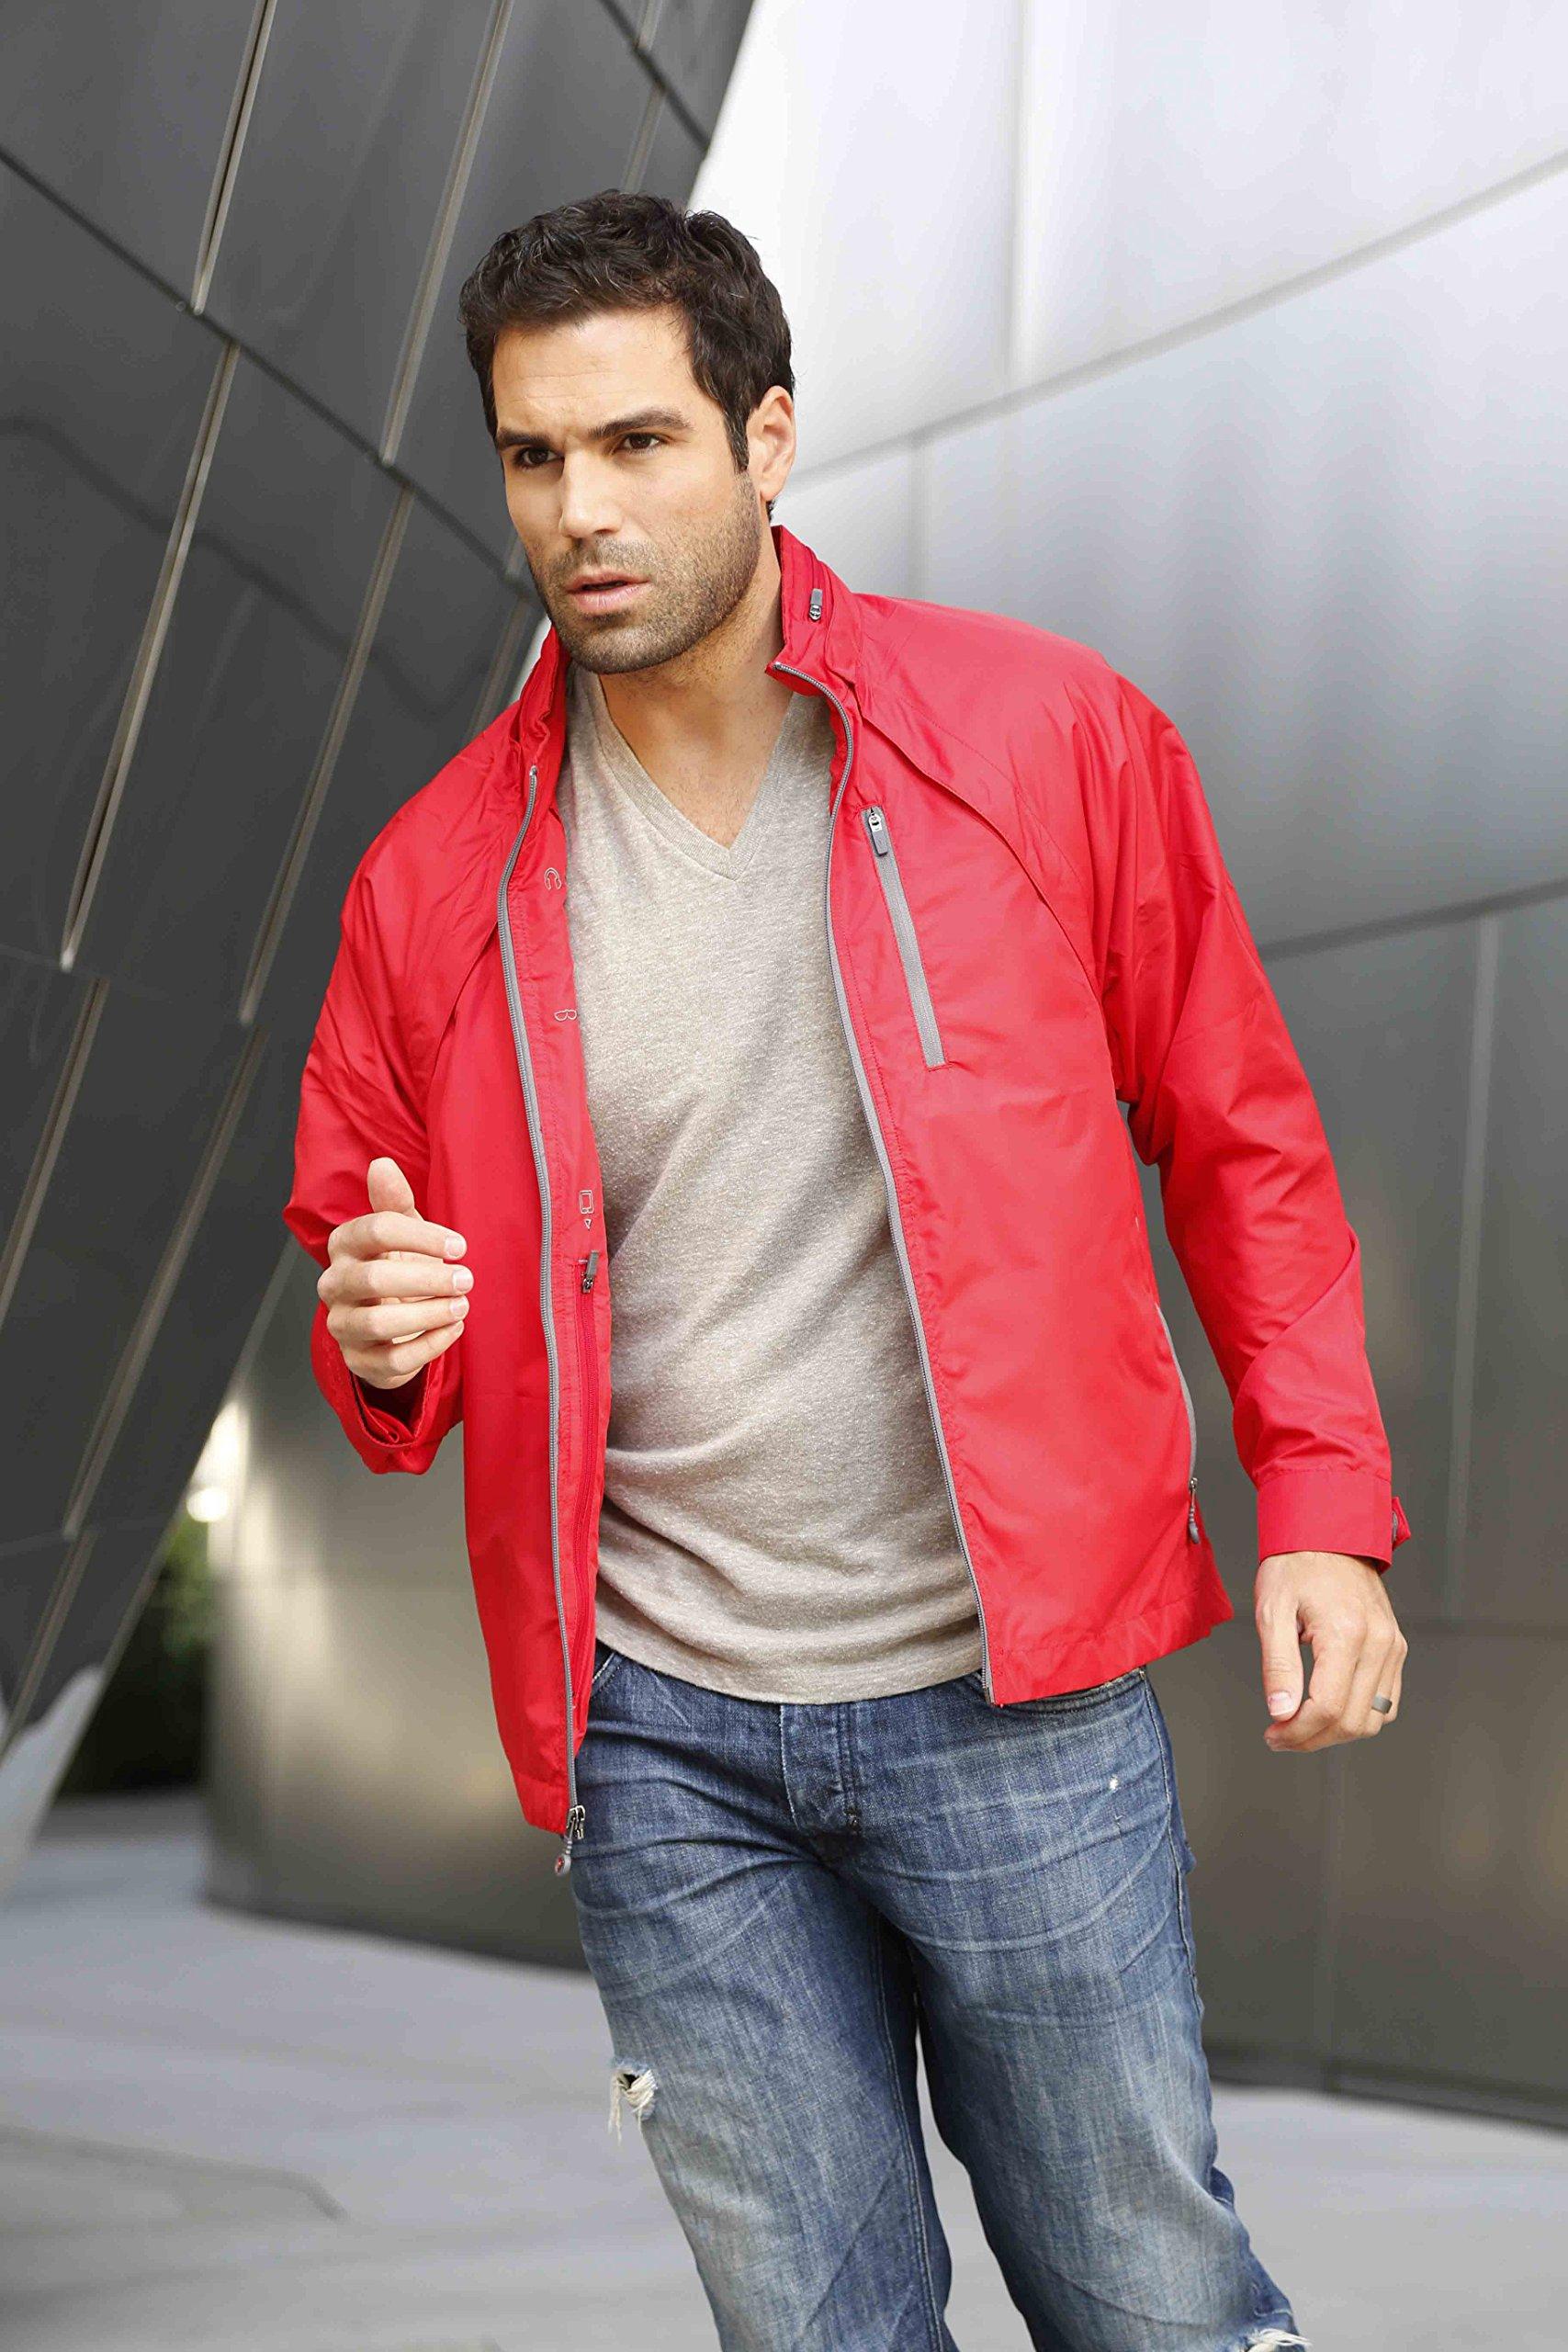 SCOTTeVEST Tropiformer Jacket - 22 Pockets – Convertible, Travel Clothing RED L by SCOTTeVEST (Image #3)